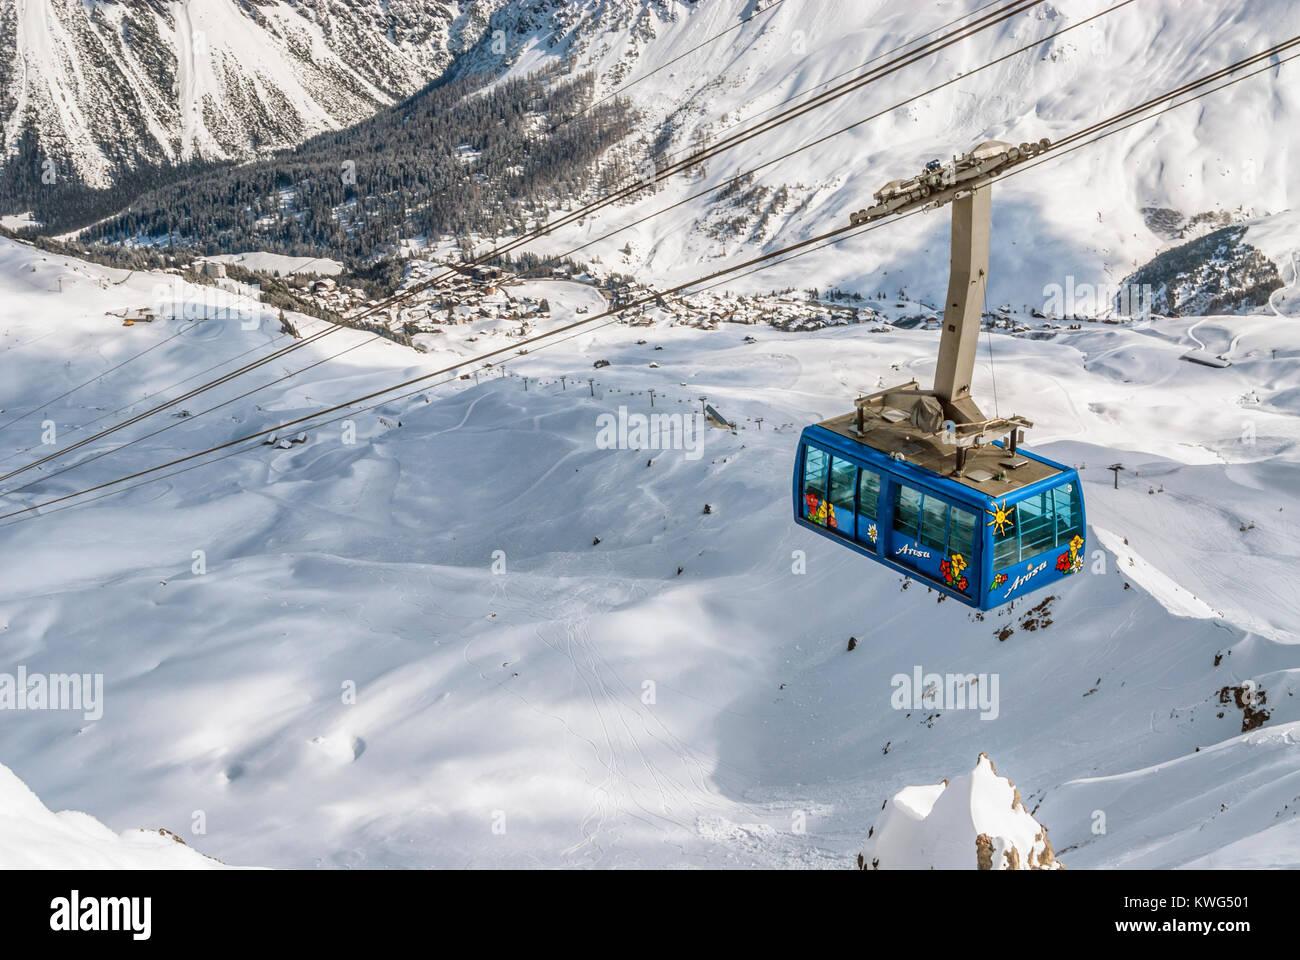 Arosa cablecar up to Weisshorn Peak at ski resort Arosa in winter, Switzerland - Stock Image